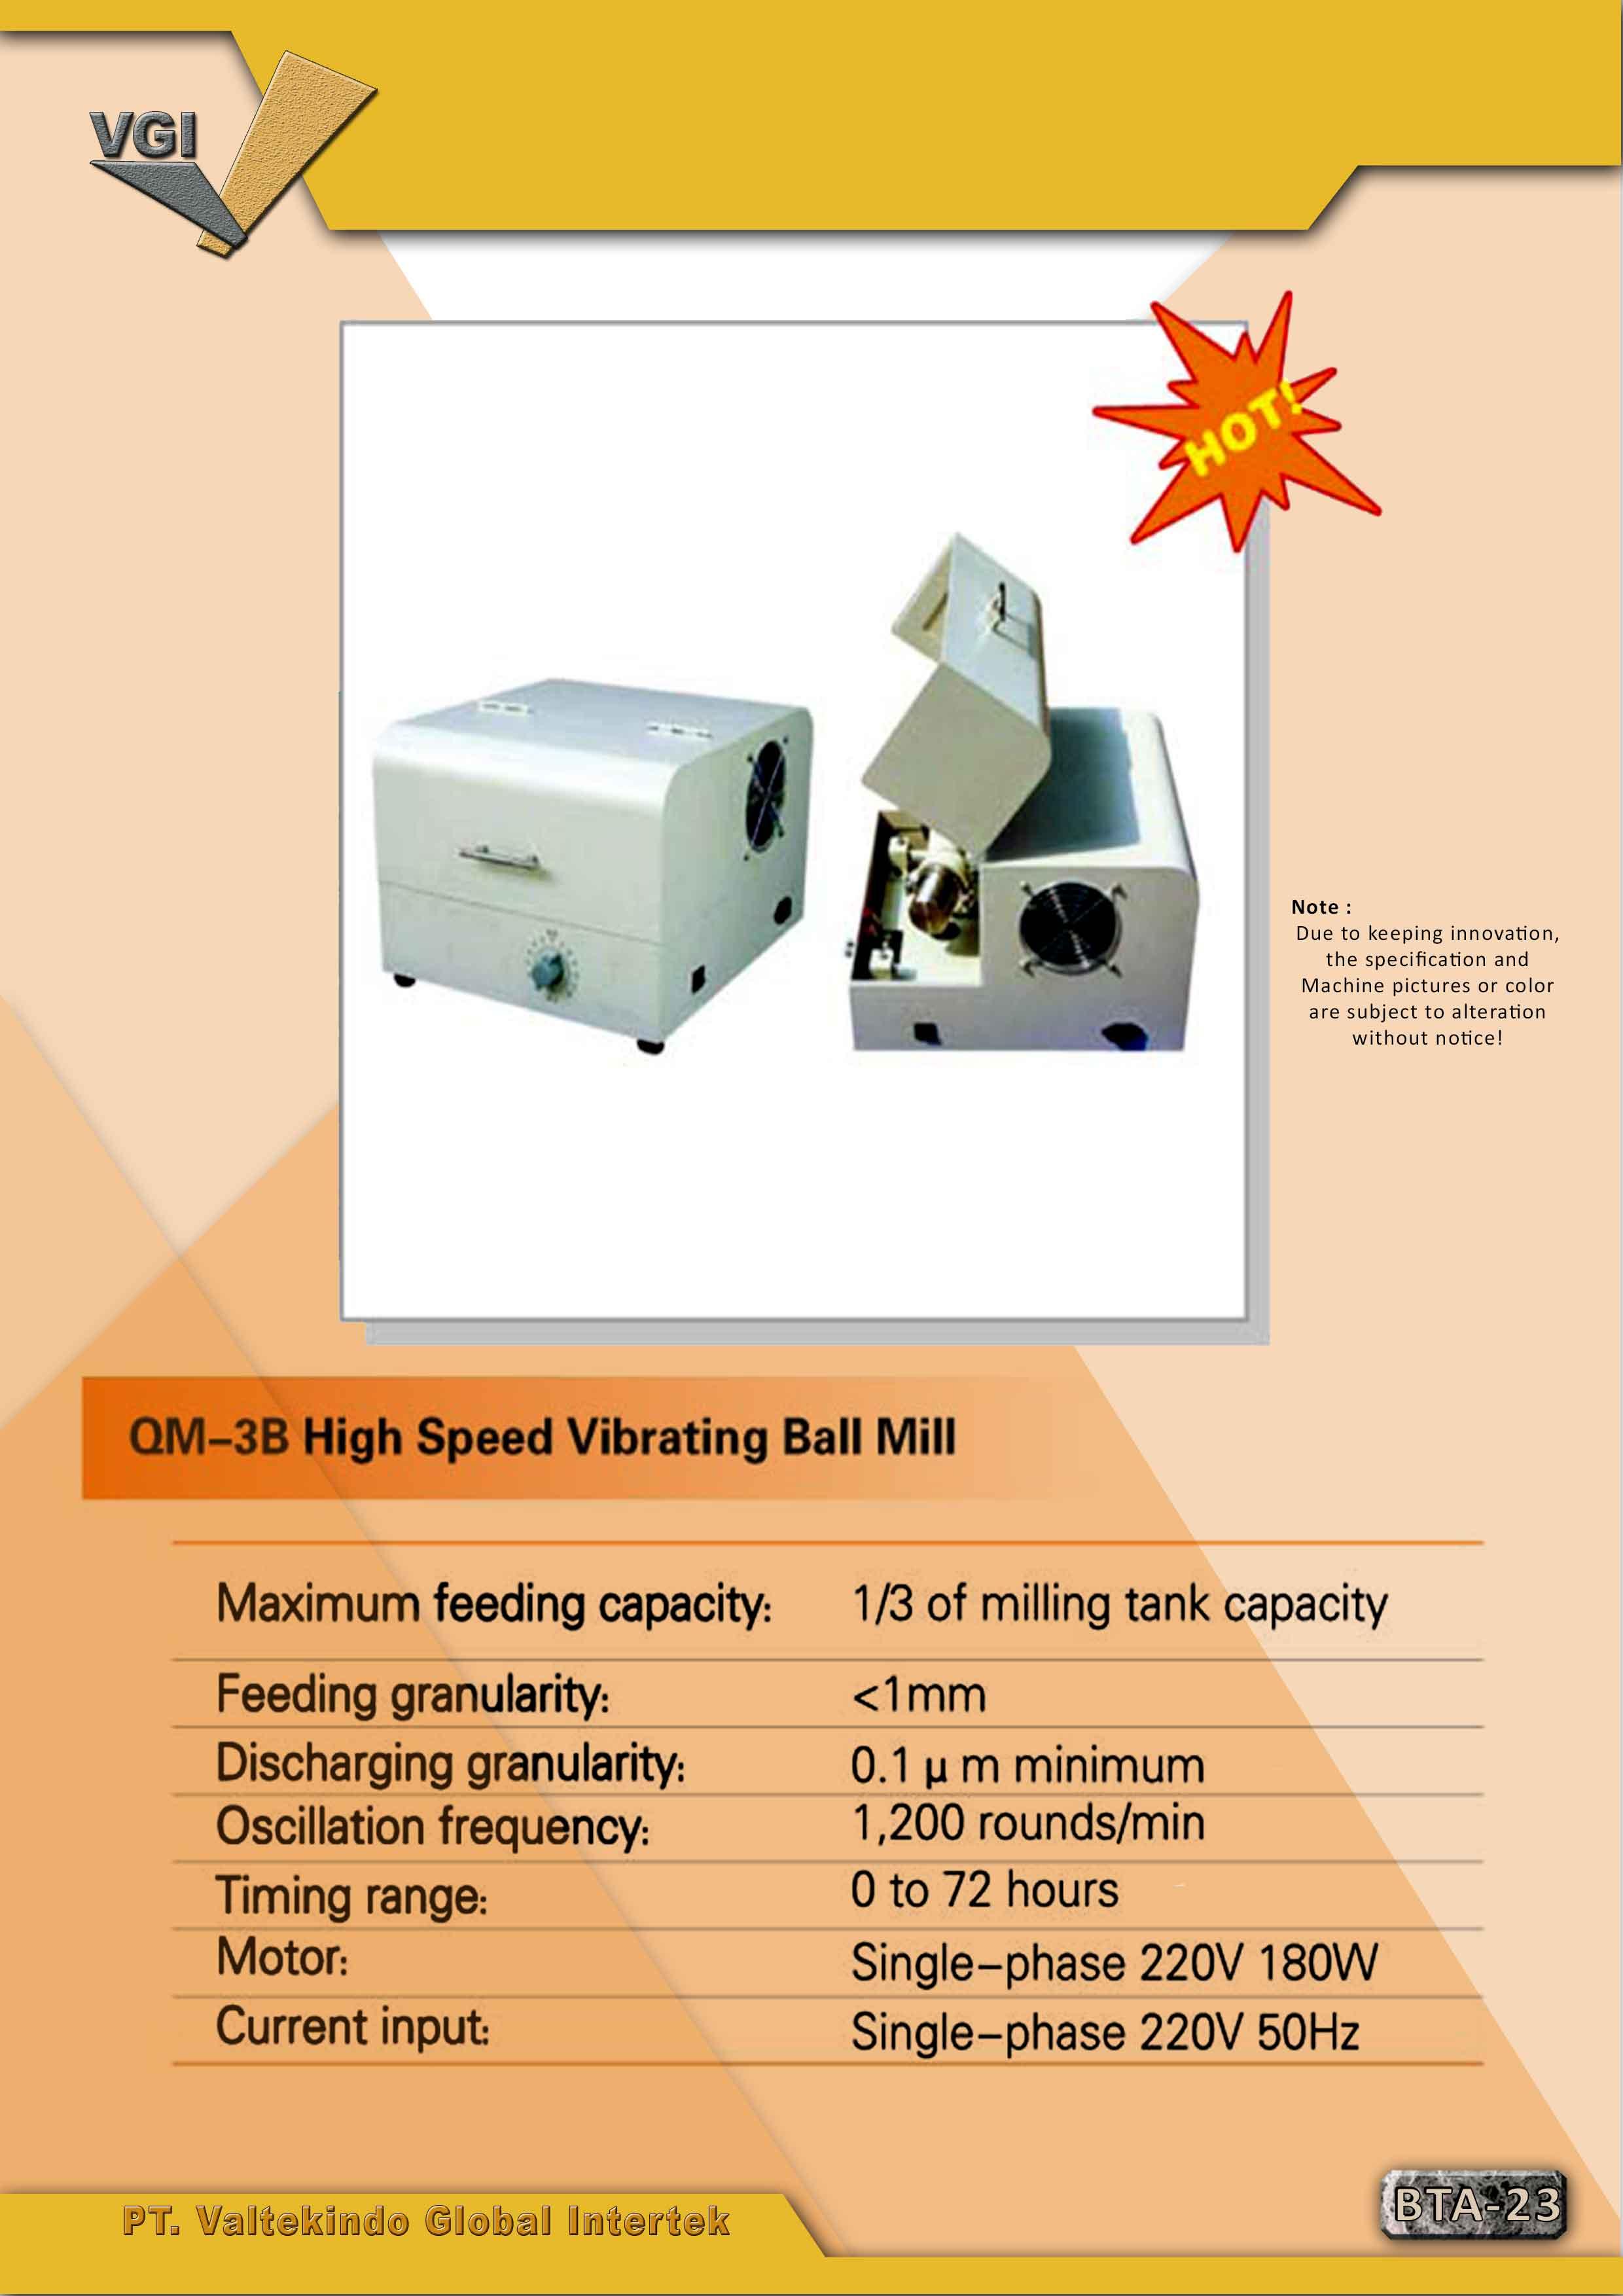 jual mesin High Speed Vibrating  Ball Mill High Speed Vibrating  Ball Mill